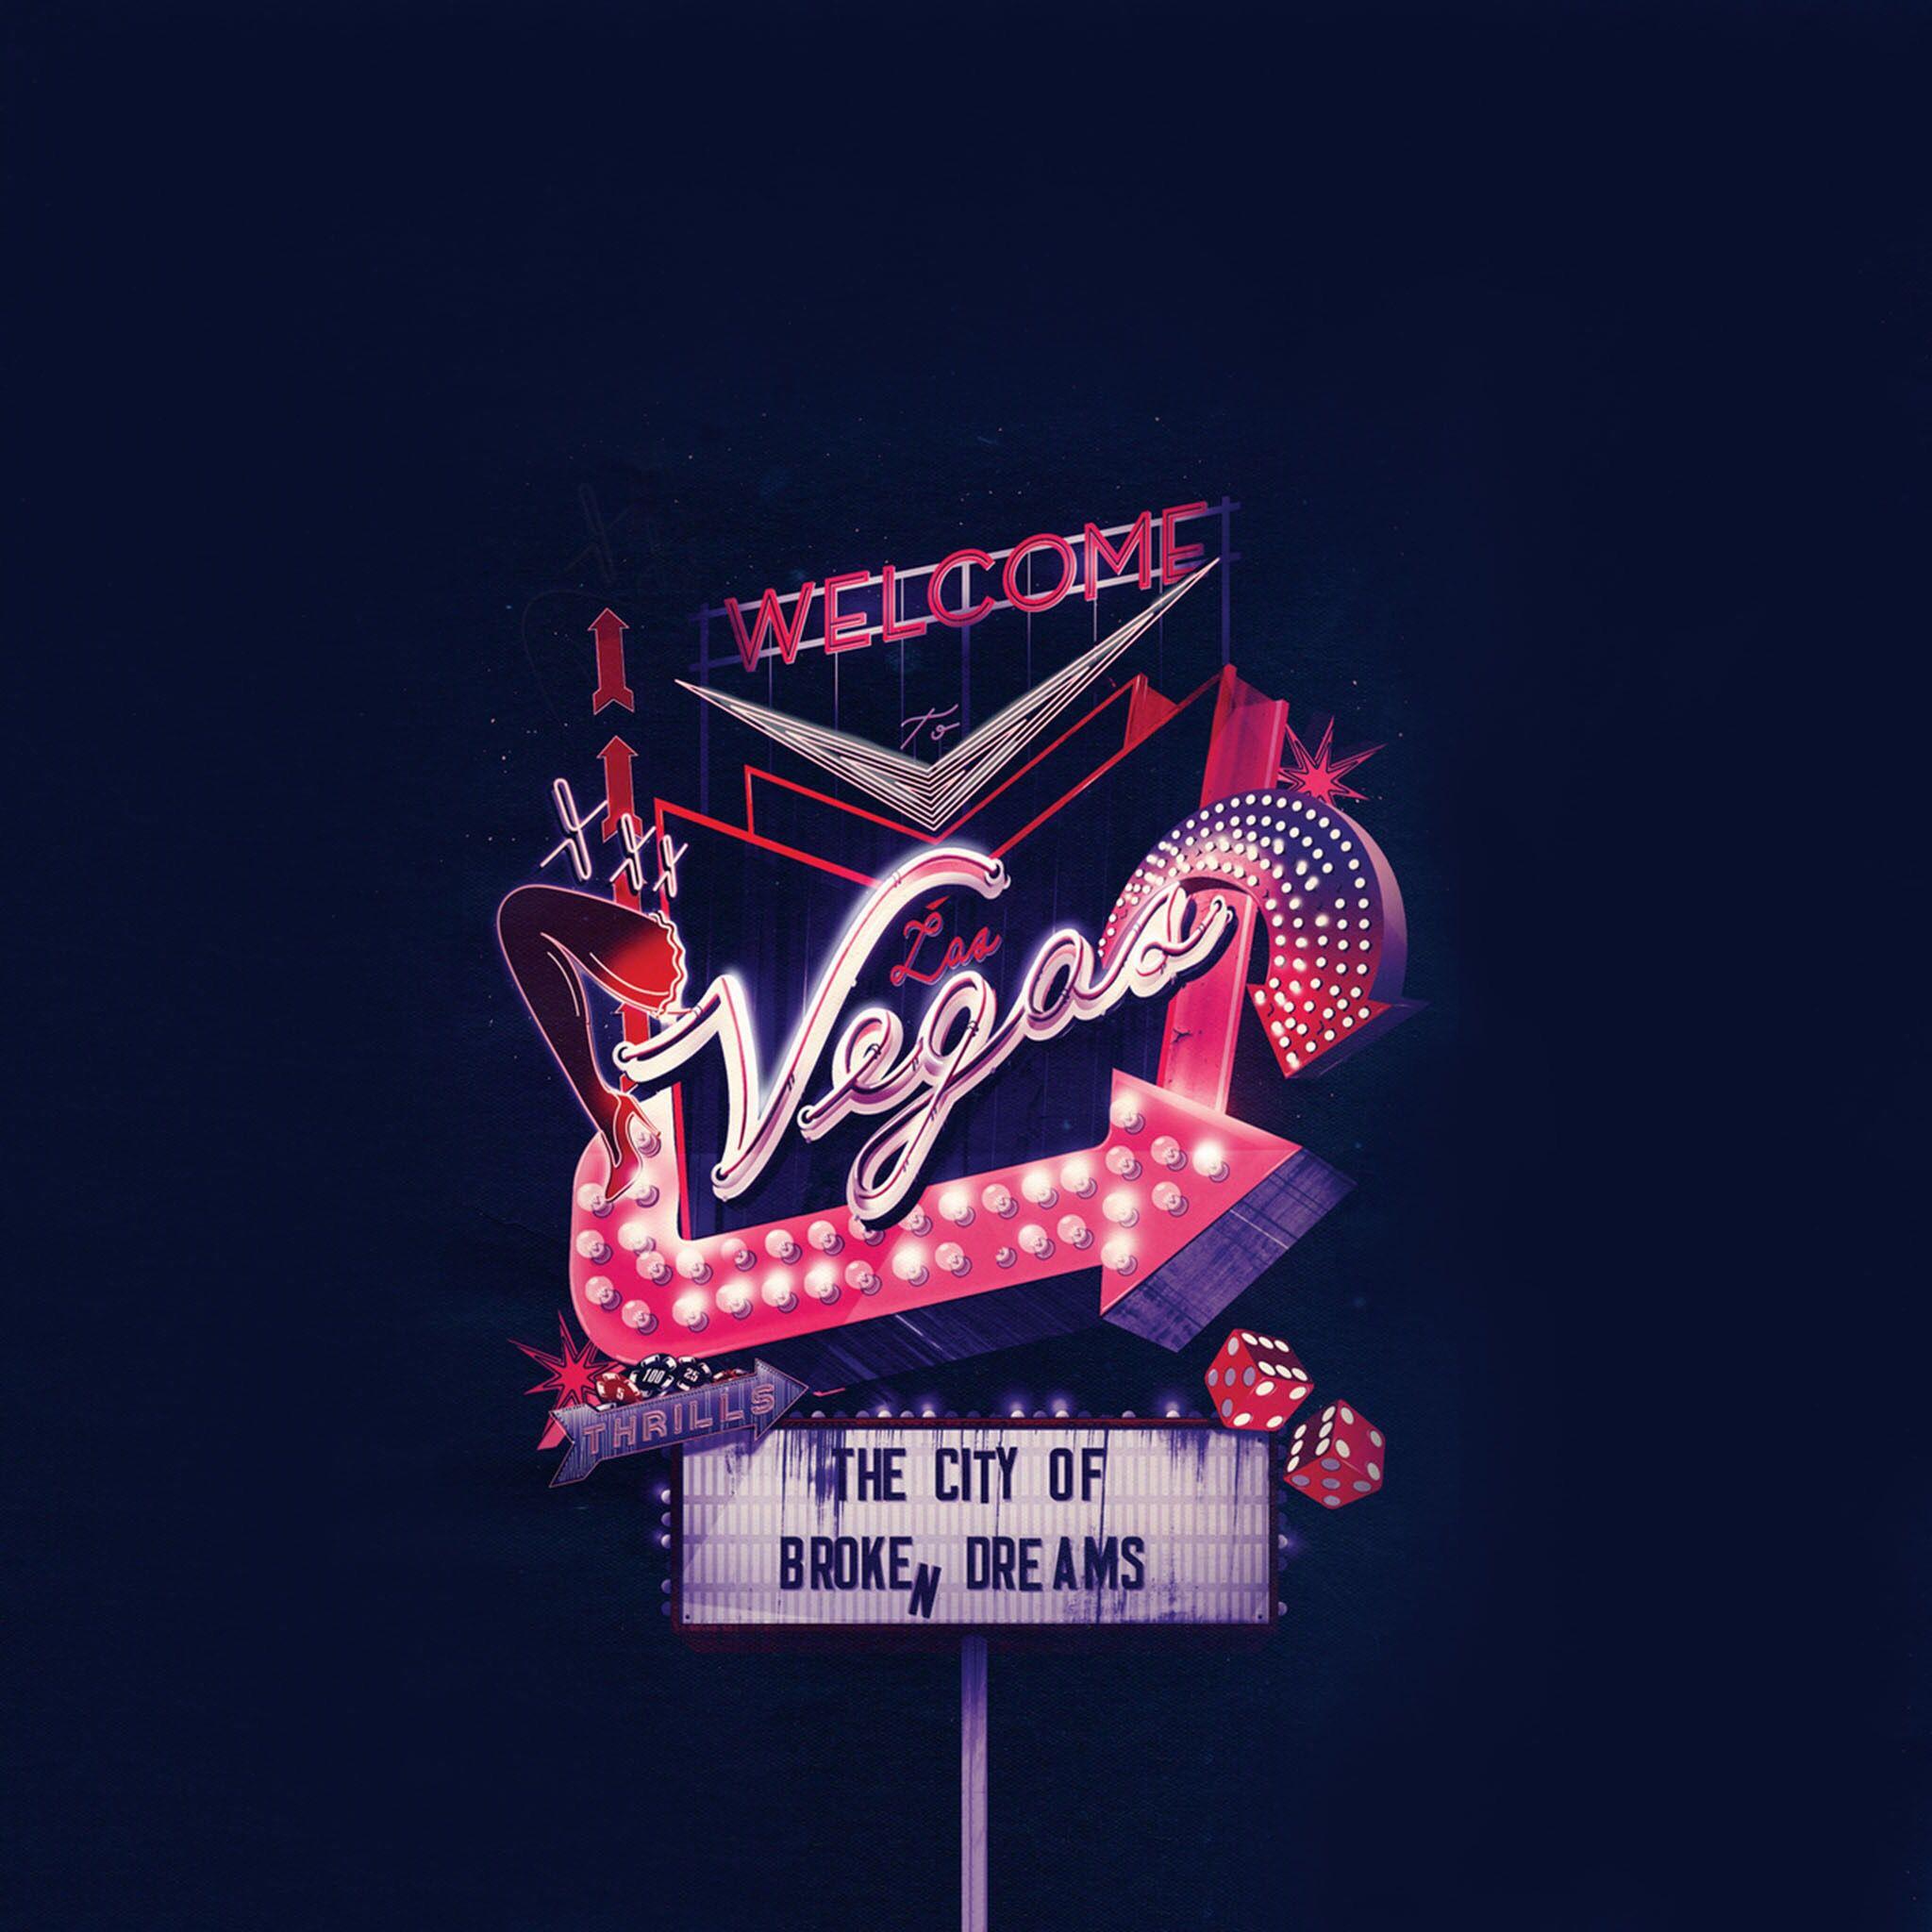 Vintage Las Vegas Wallpaper Quotes Neon Signs Interesting Art